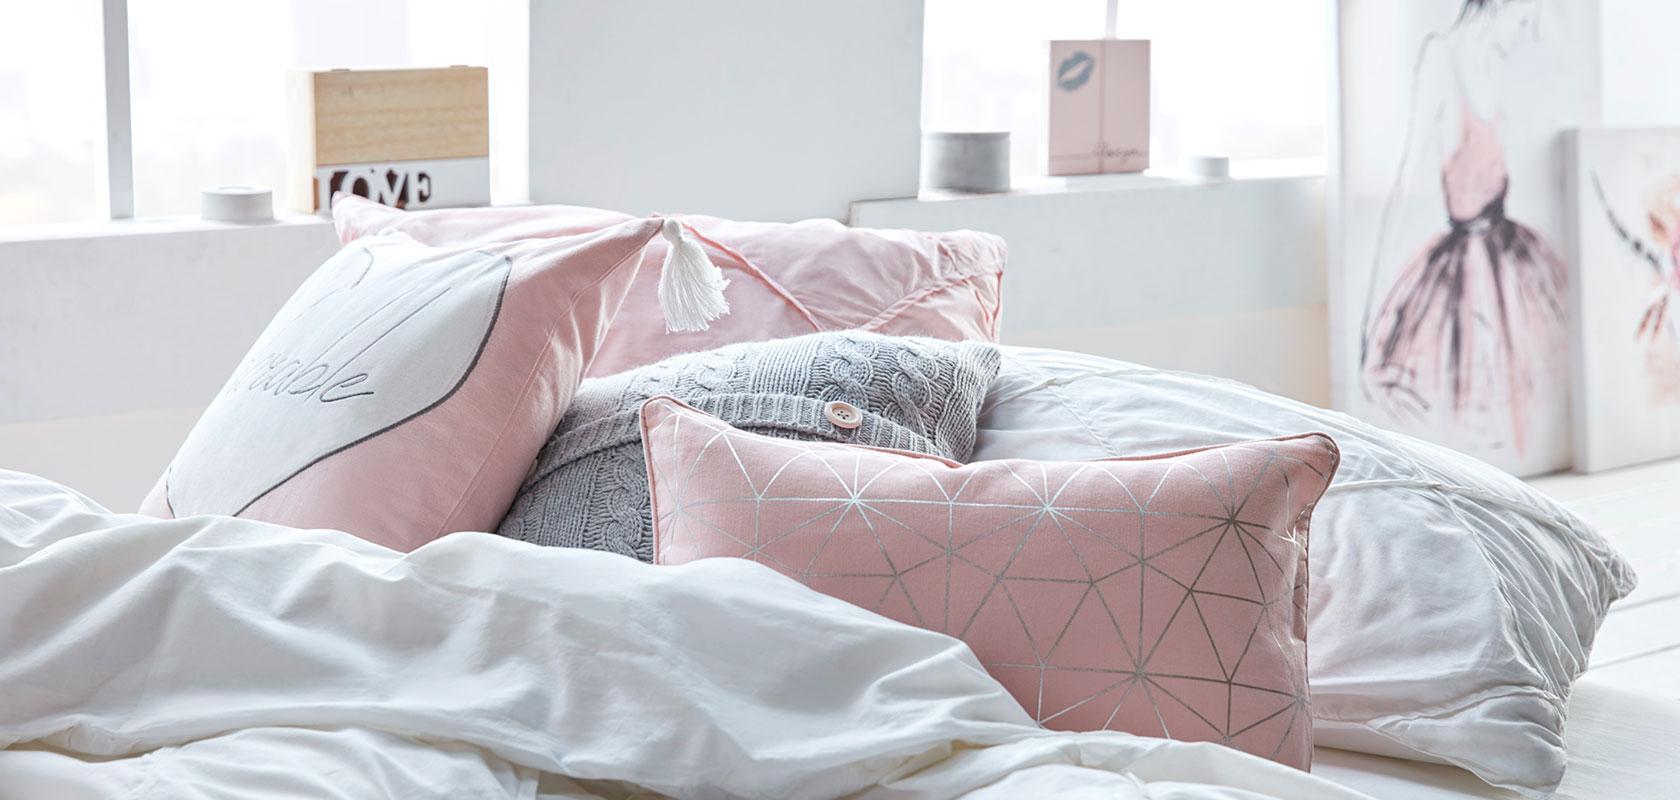 Canada's Best Furniture & Home Decor Store